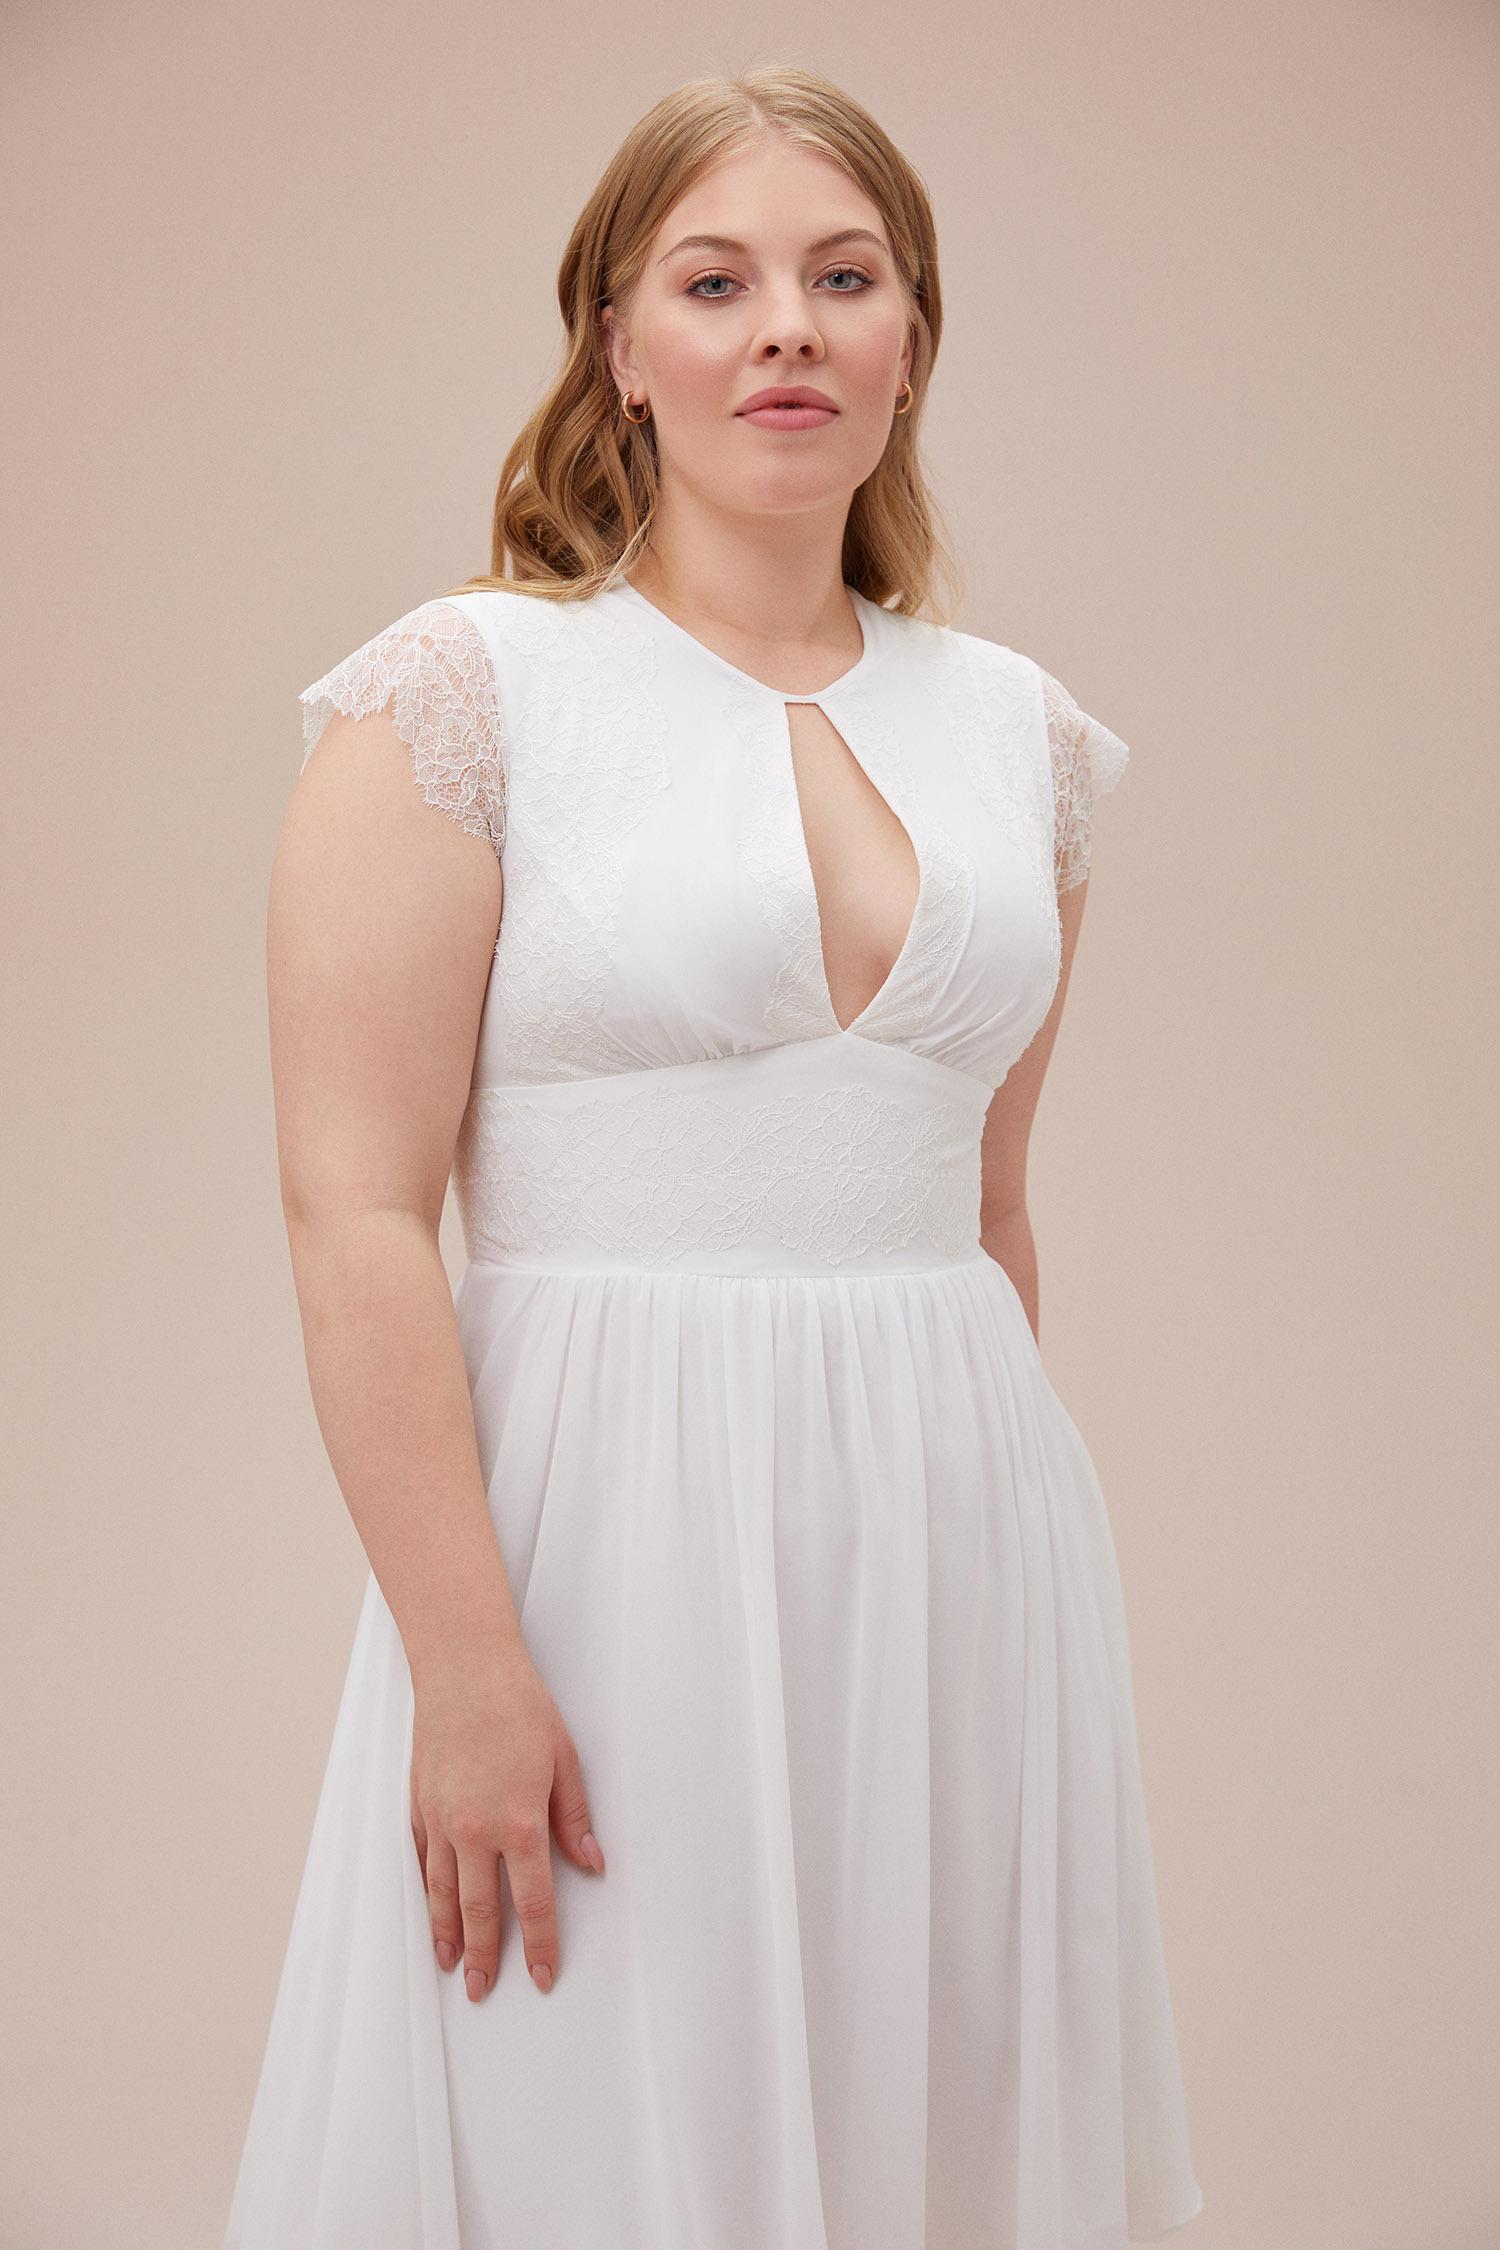 Beyaz Kap Kol Şifon Midi Boy Büyük Beden Nikah Elbisesi - Thumbnail